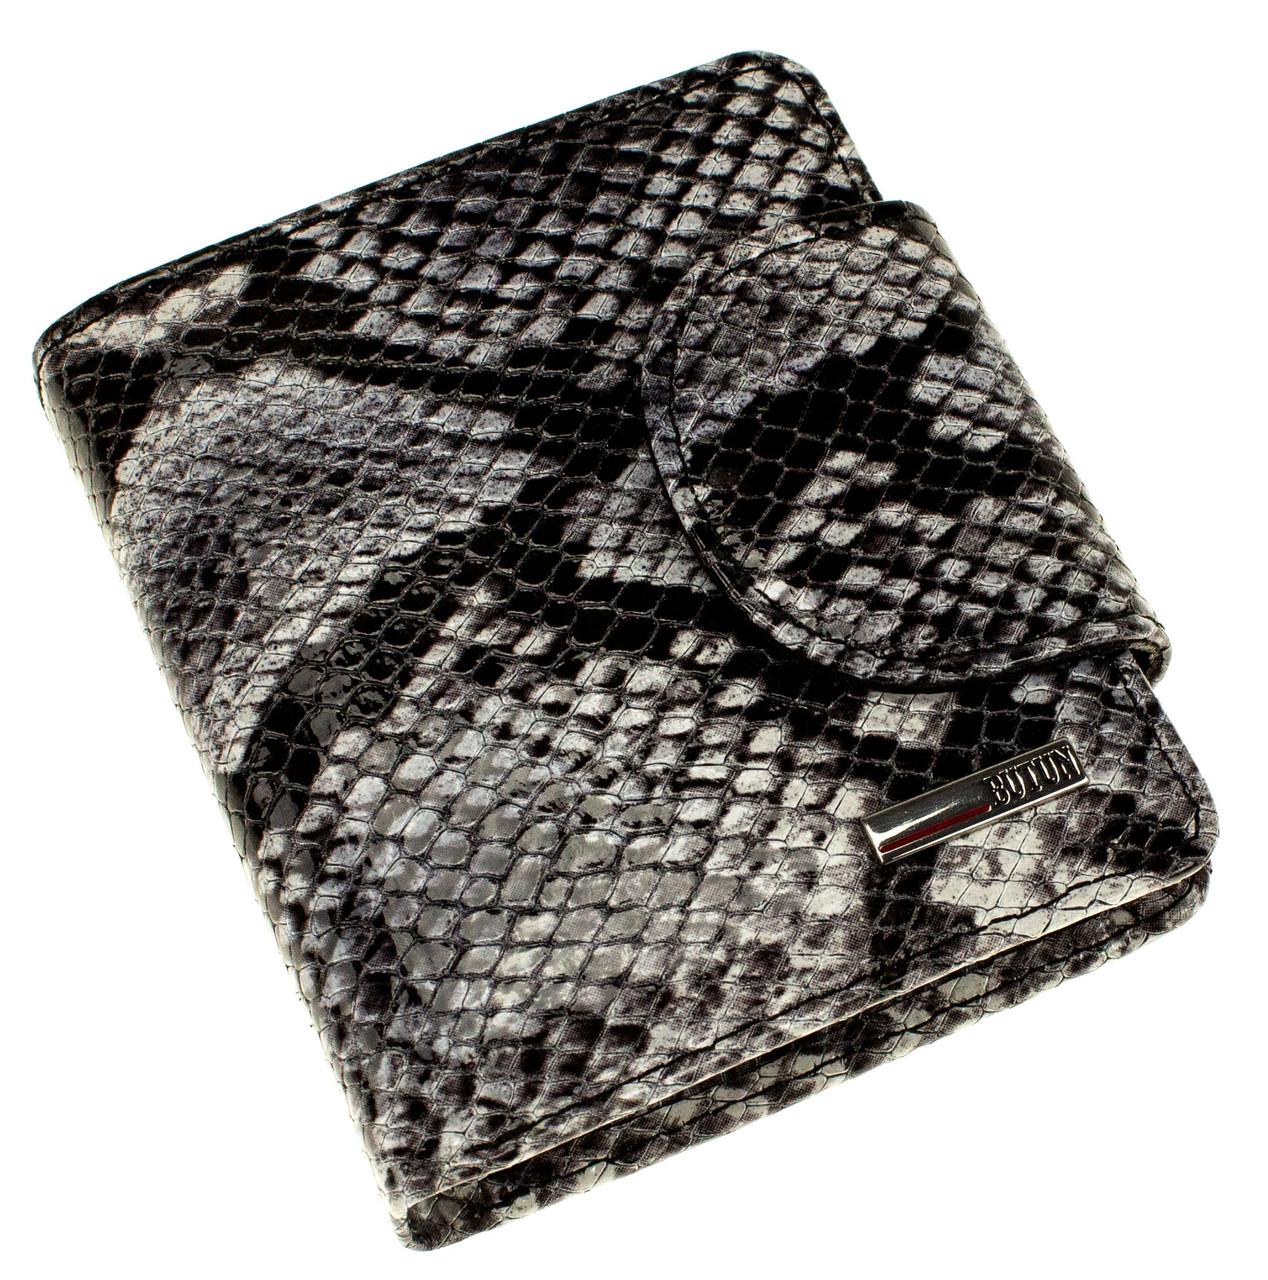 "Женский кошелек Butun 550-038-021 кожаный серый ""под рептилию"""